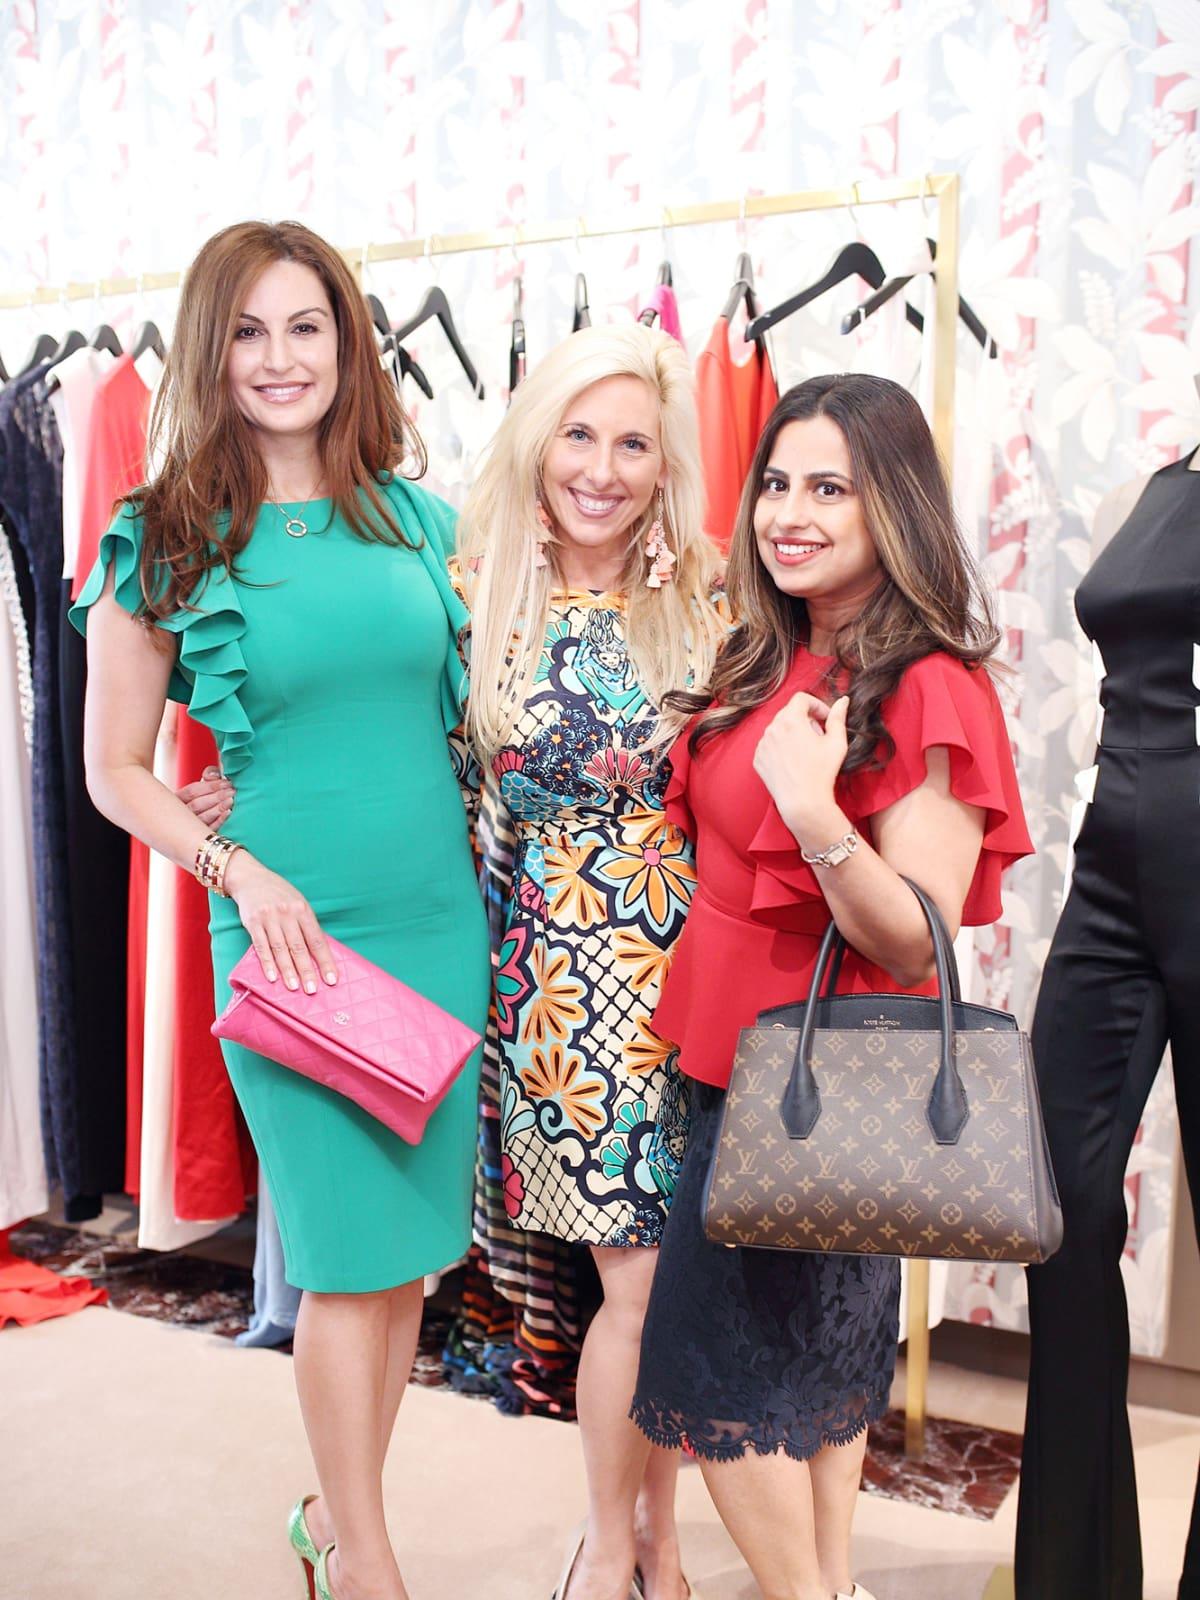 Brigitte Kalai, Tracey Faulkner, Ruchi Mukherjee at The Webster party